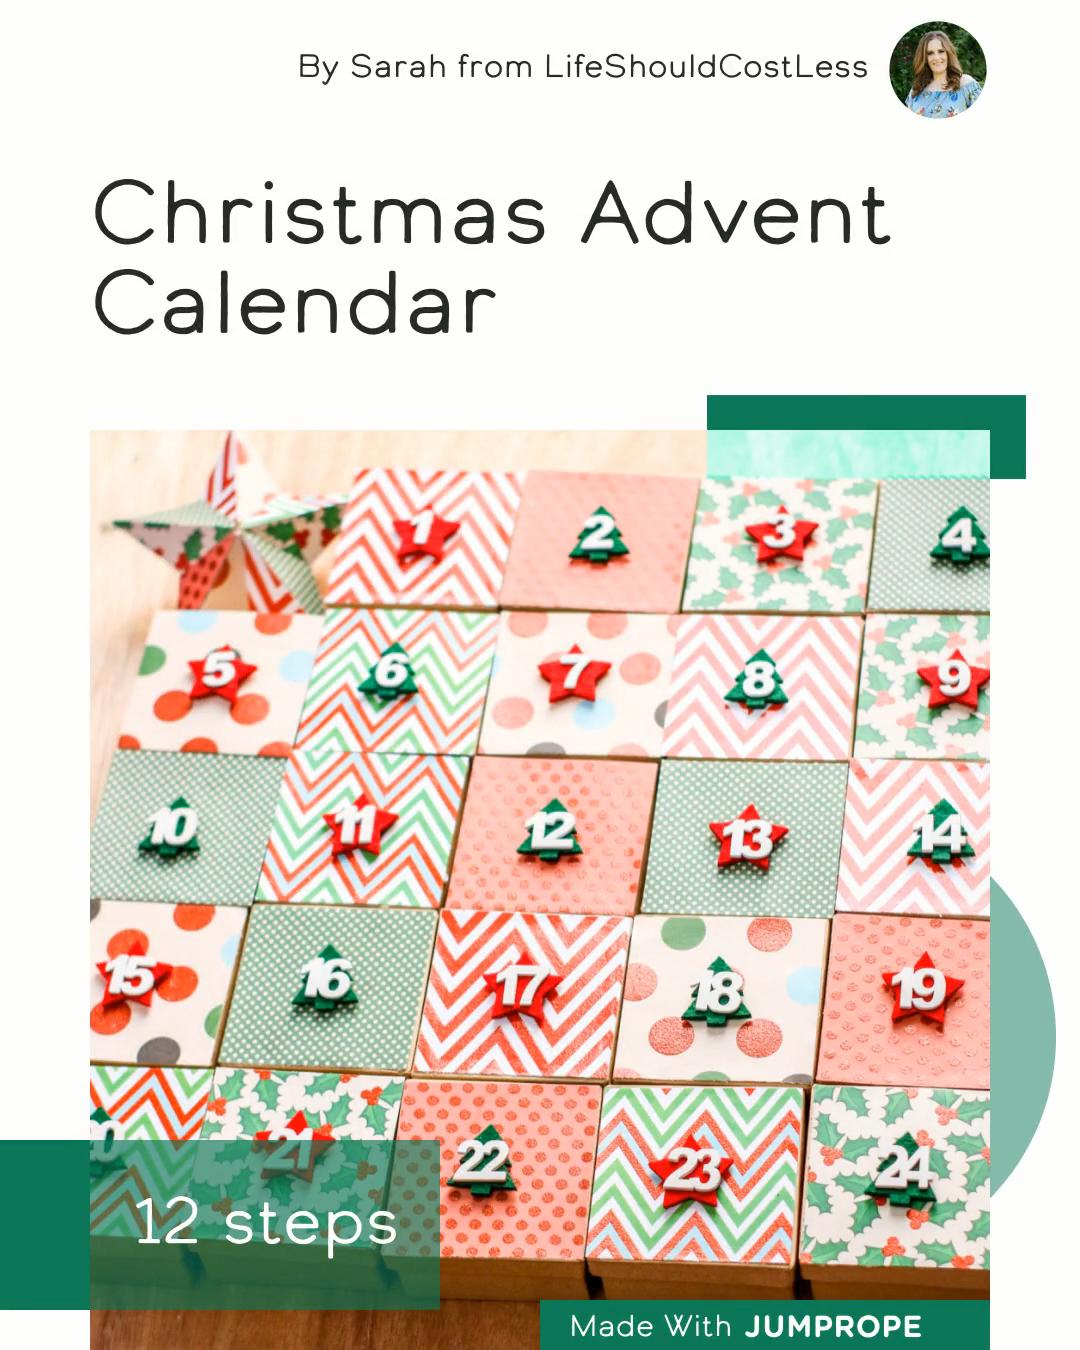 Christmas Advent Calendar in 12 steps #christmas #diychristmas #christmasdecor #holiday #christmasparty #wintercrafts #adventcalendar